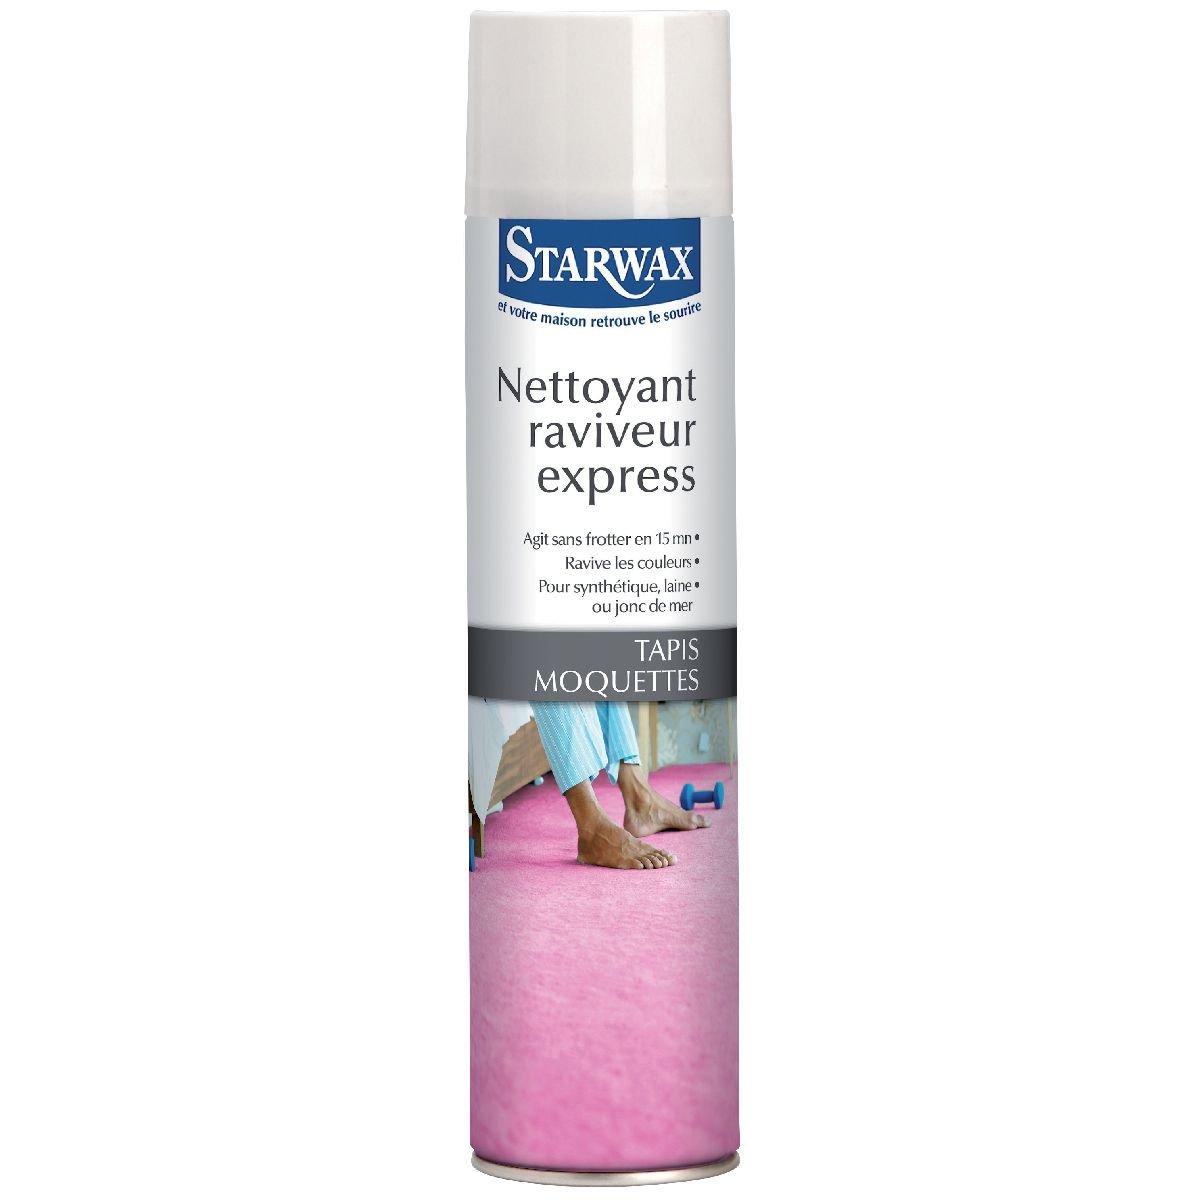 Nettoyant moquettes Starwax